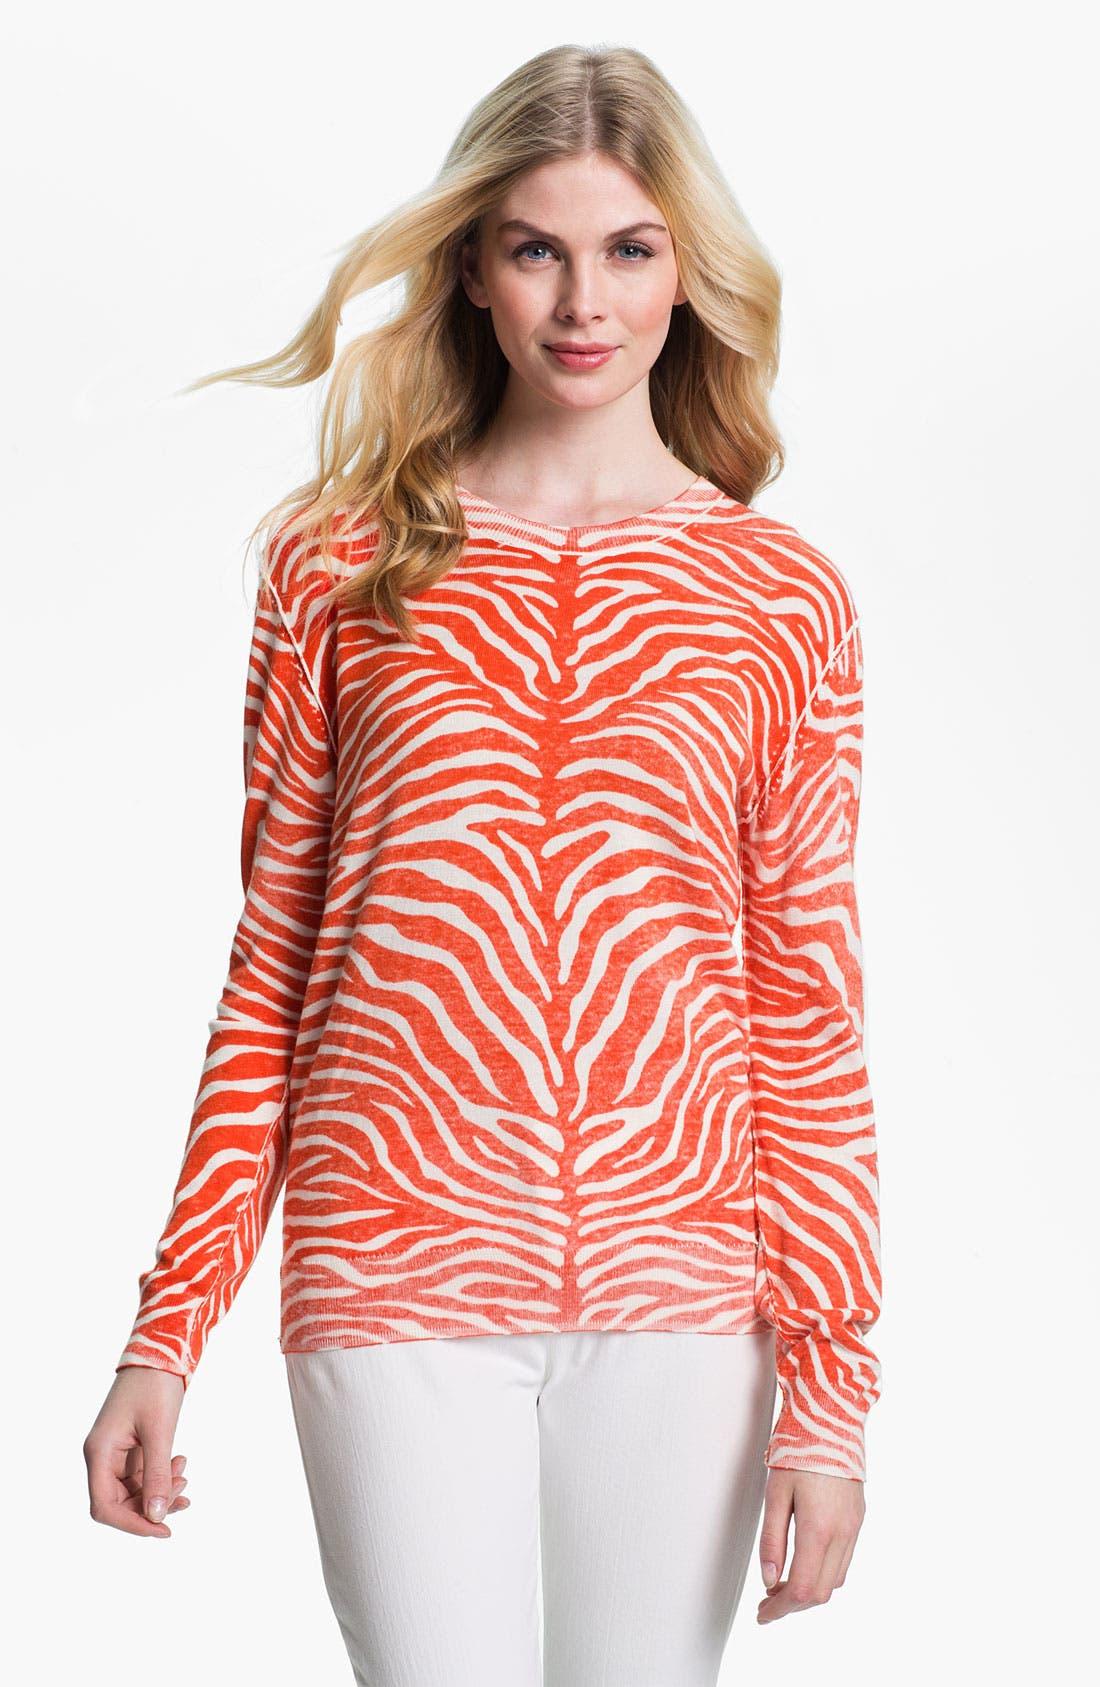 Main Image - MICHAEL Michael Kors Zebra Print Sweater